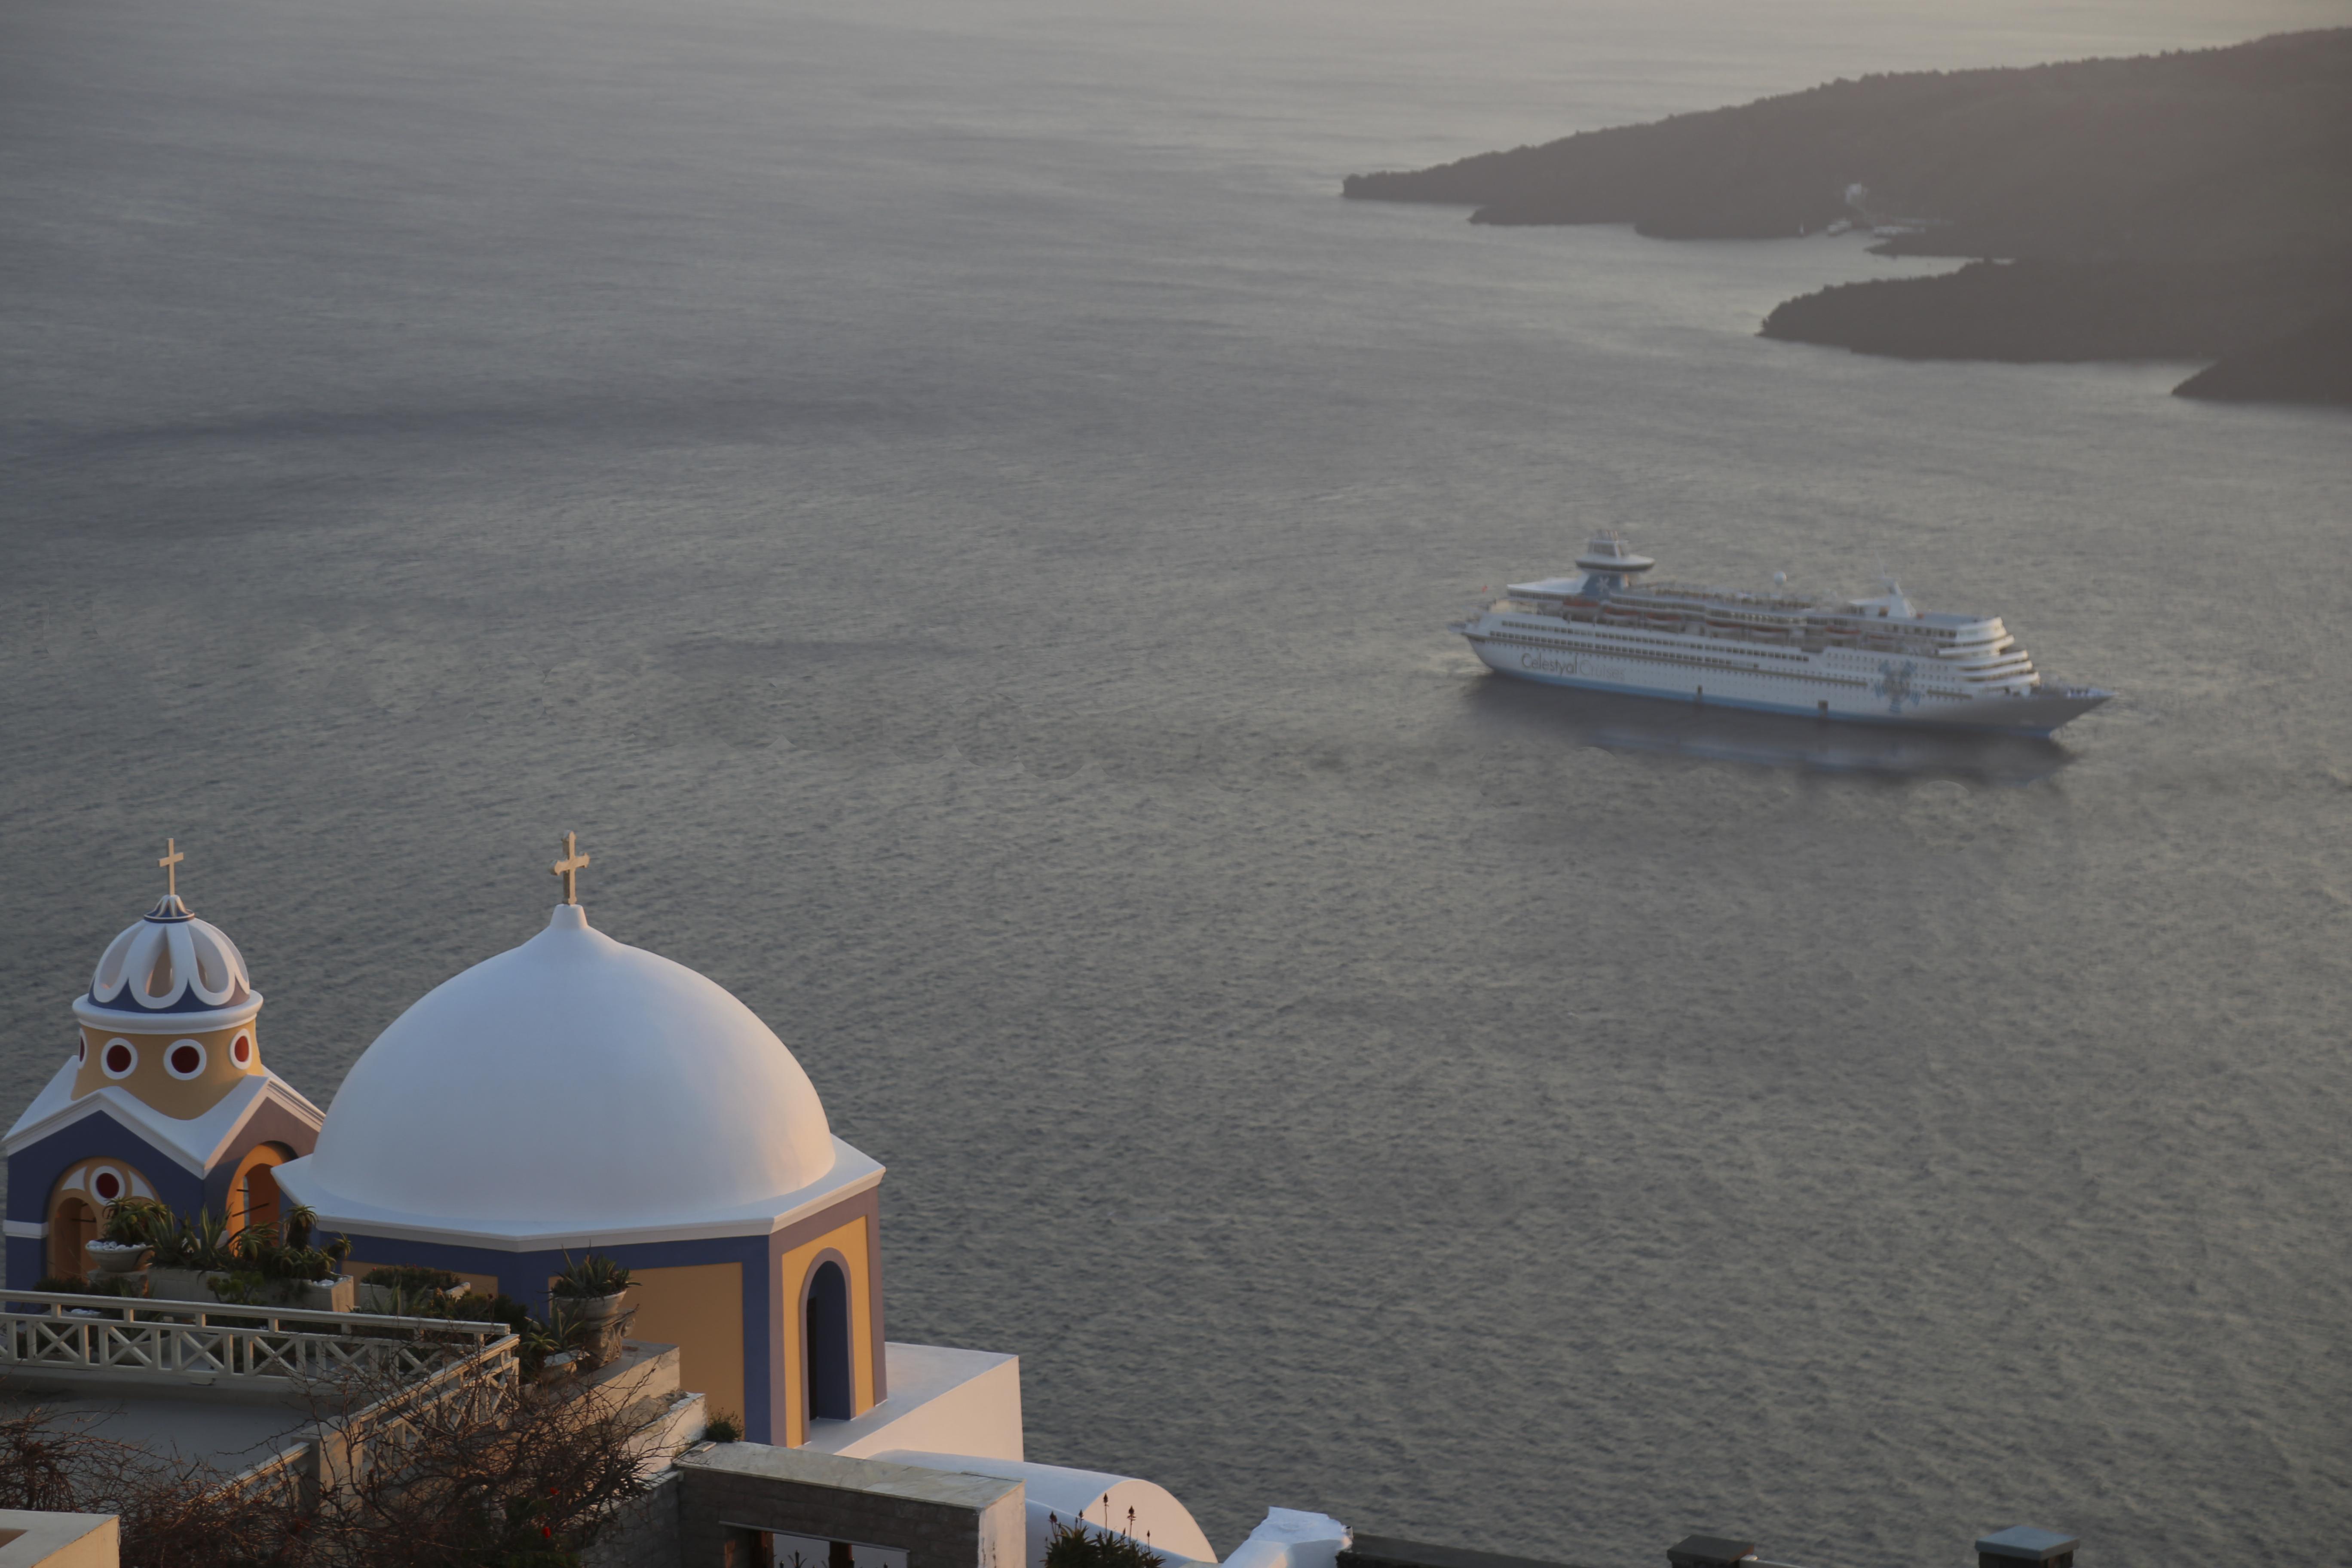 Santorini church with cruise - edited